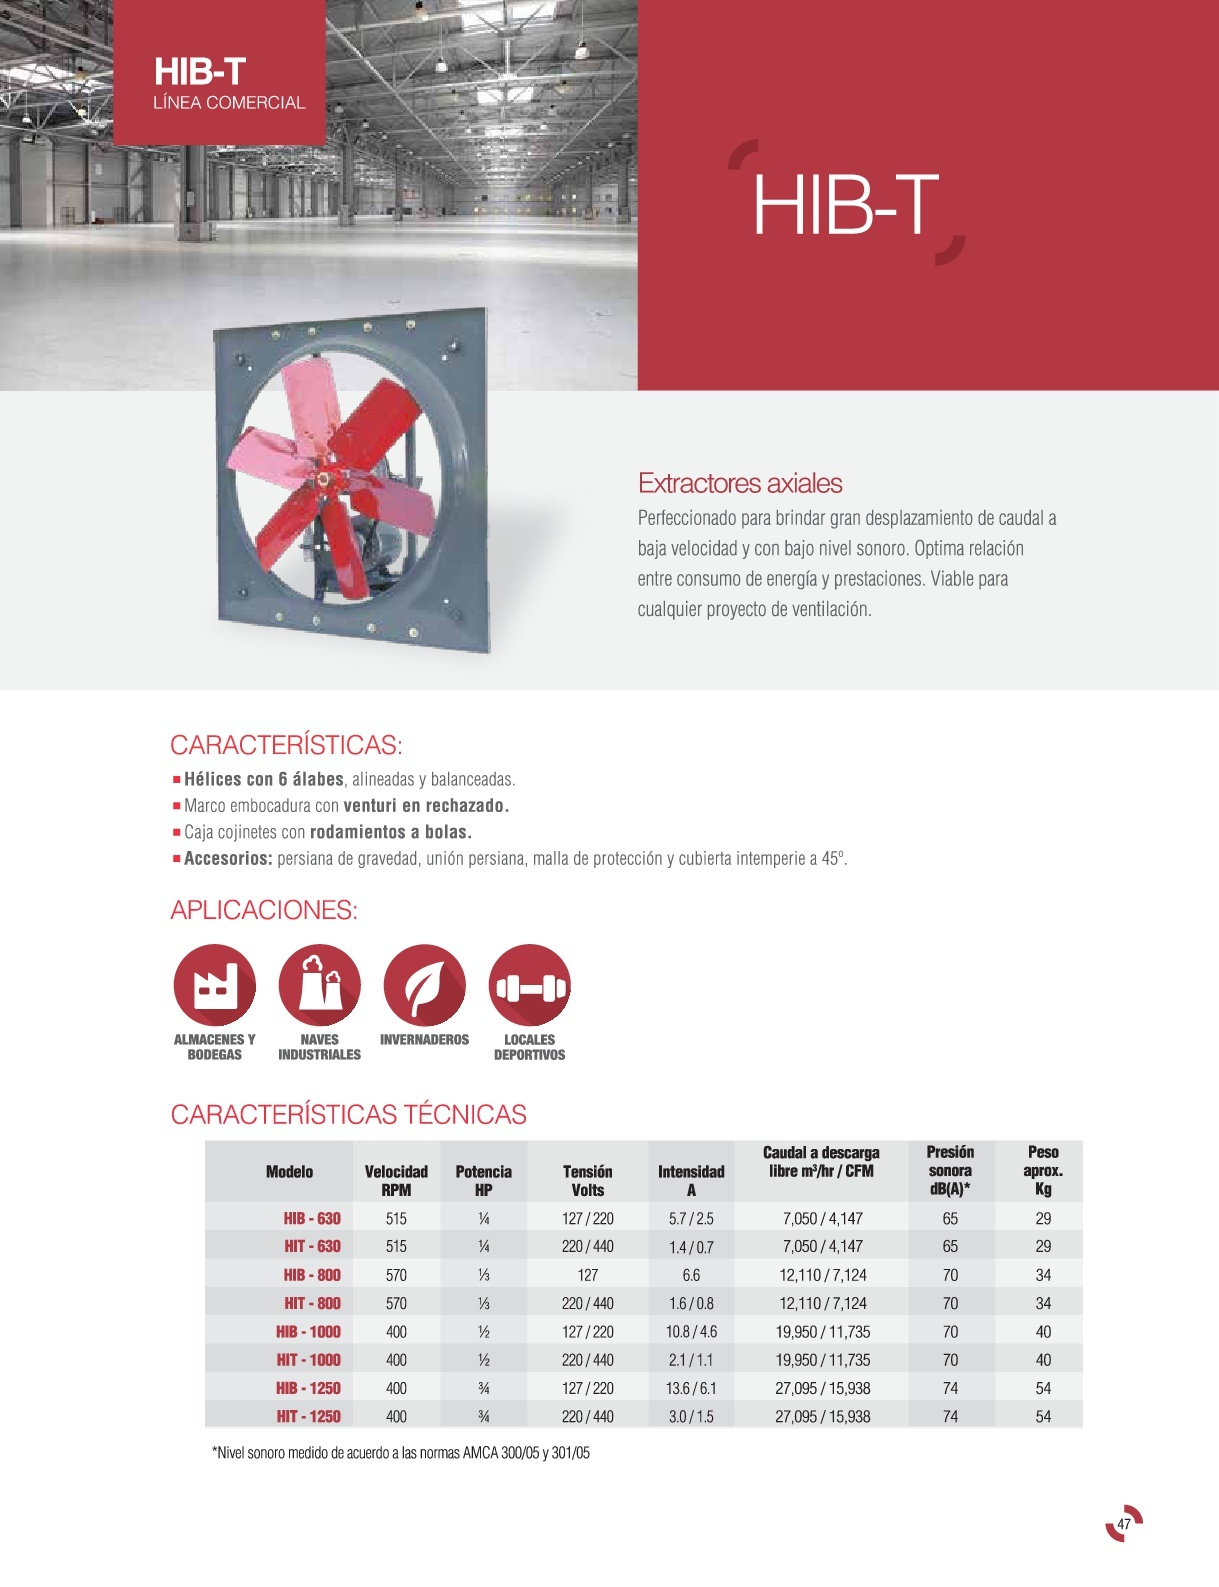 HIB-001